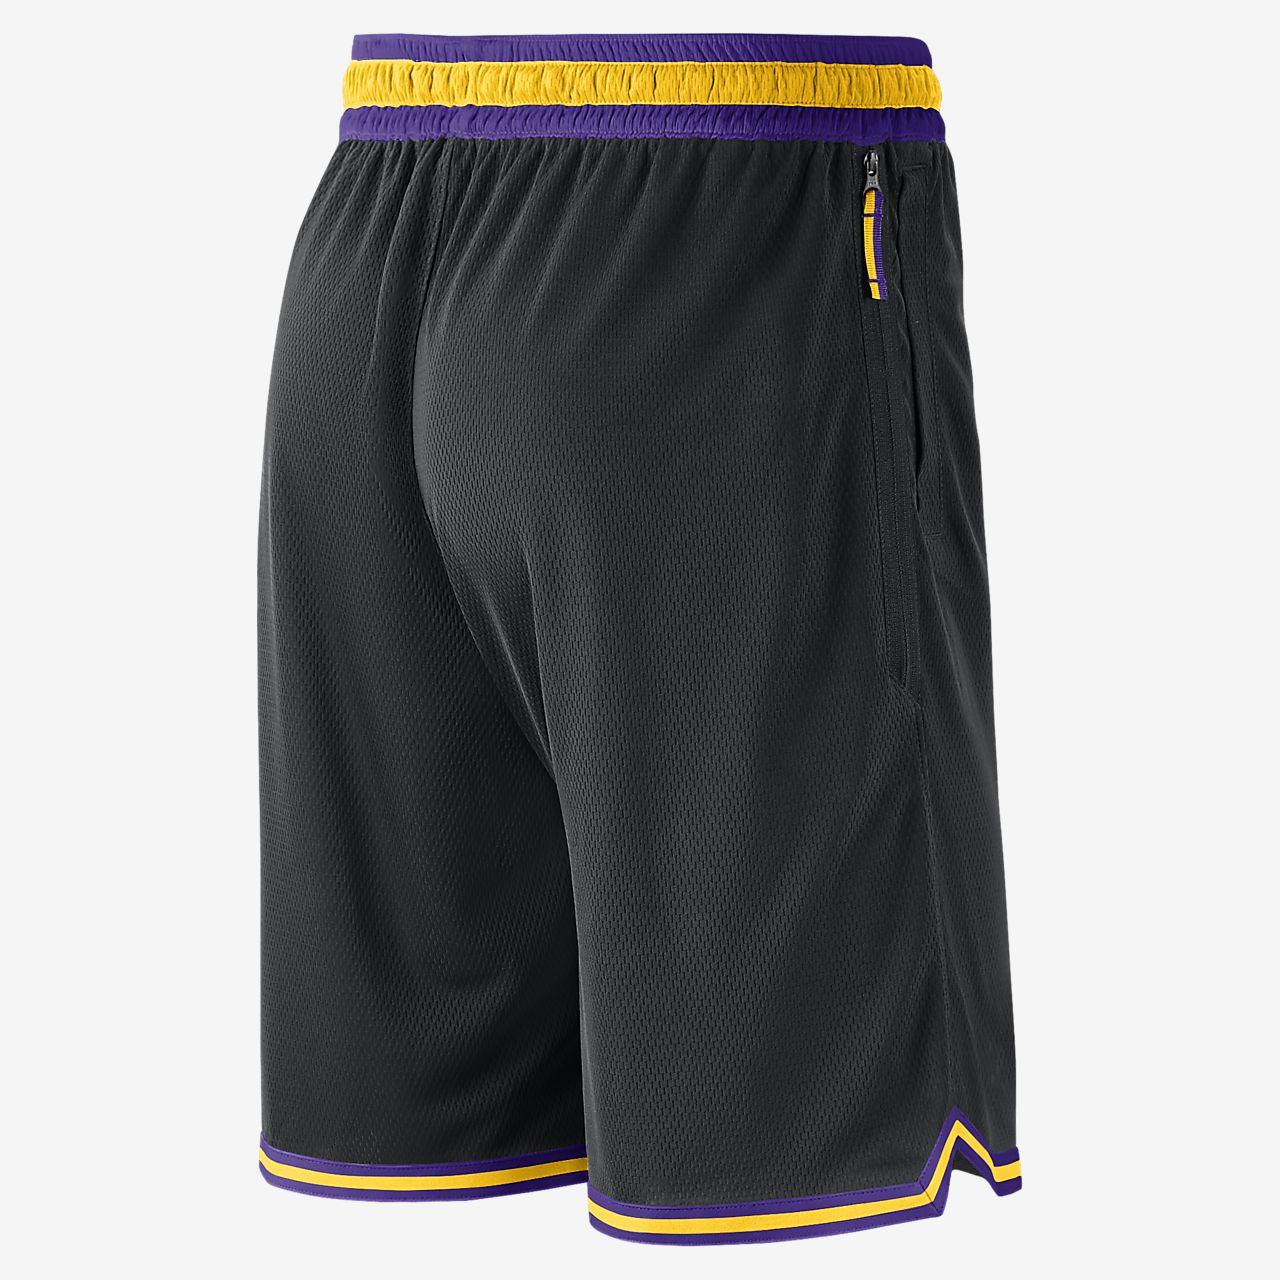 NBA x Nike Air Force 1 Low Los Angeles Lakers | HYPEBEAST